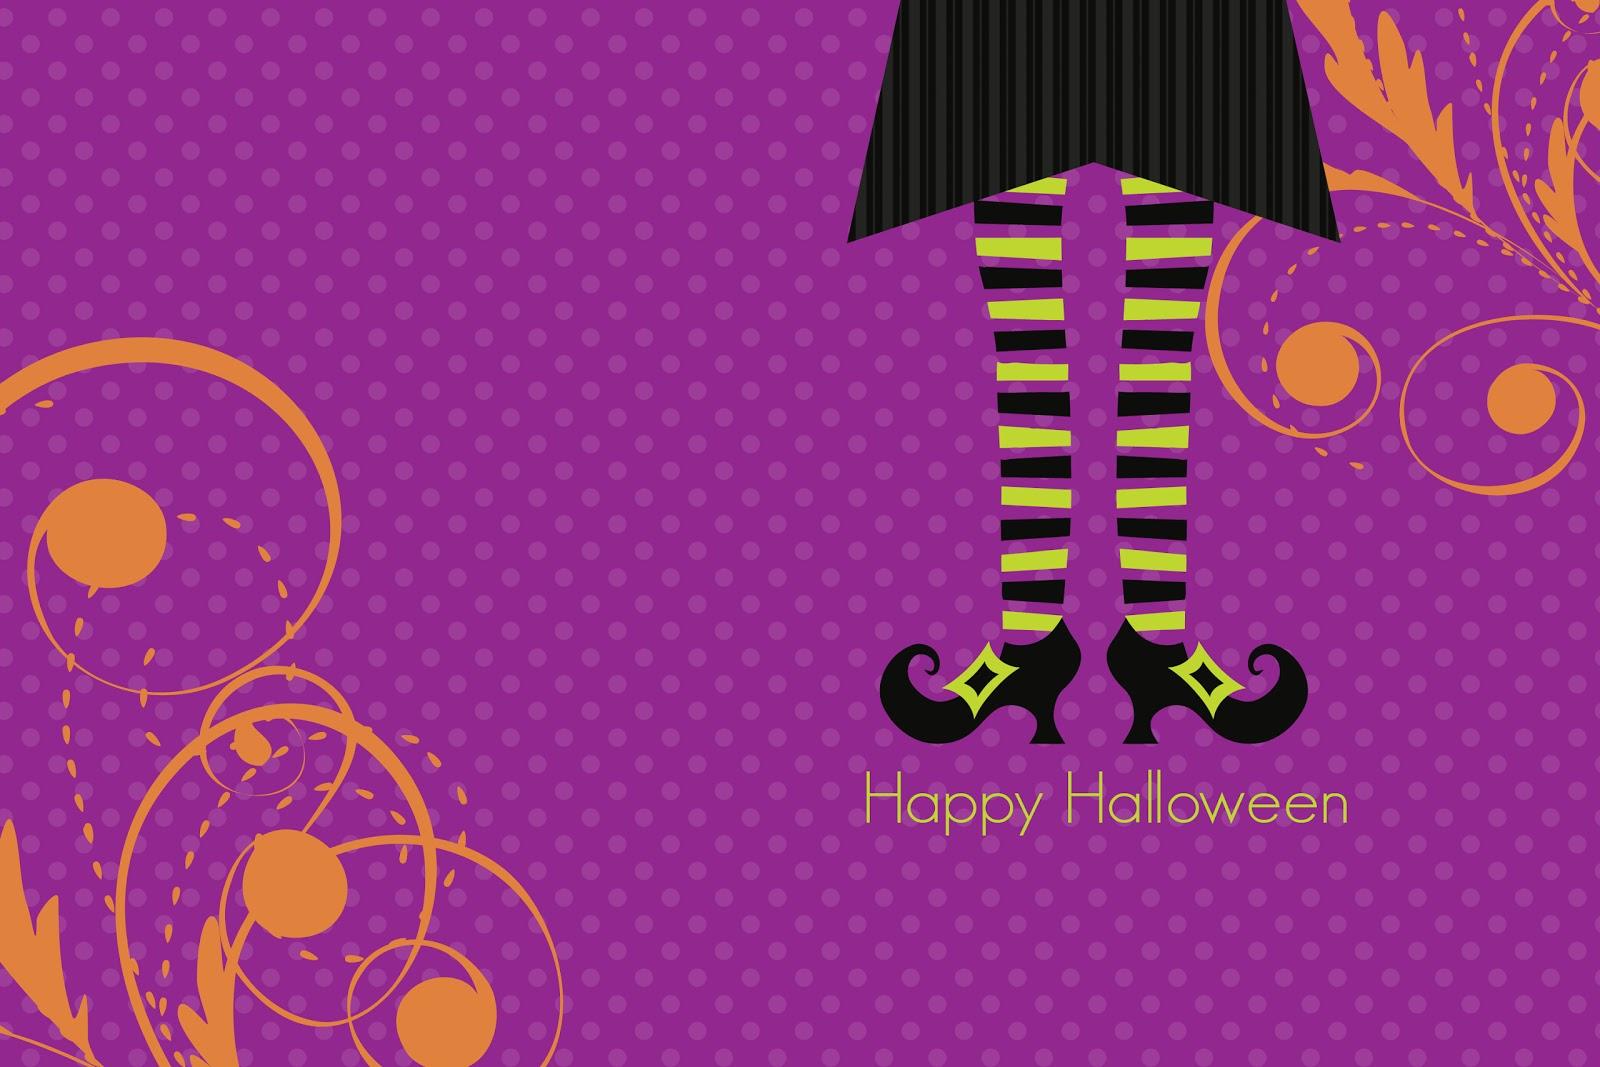 Most Inspiring Wallpaper Halloween Purple - 4RQvPO  Graphic_672210.jpg